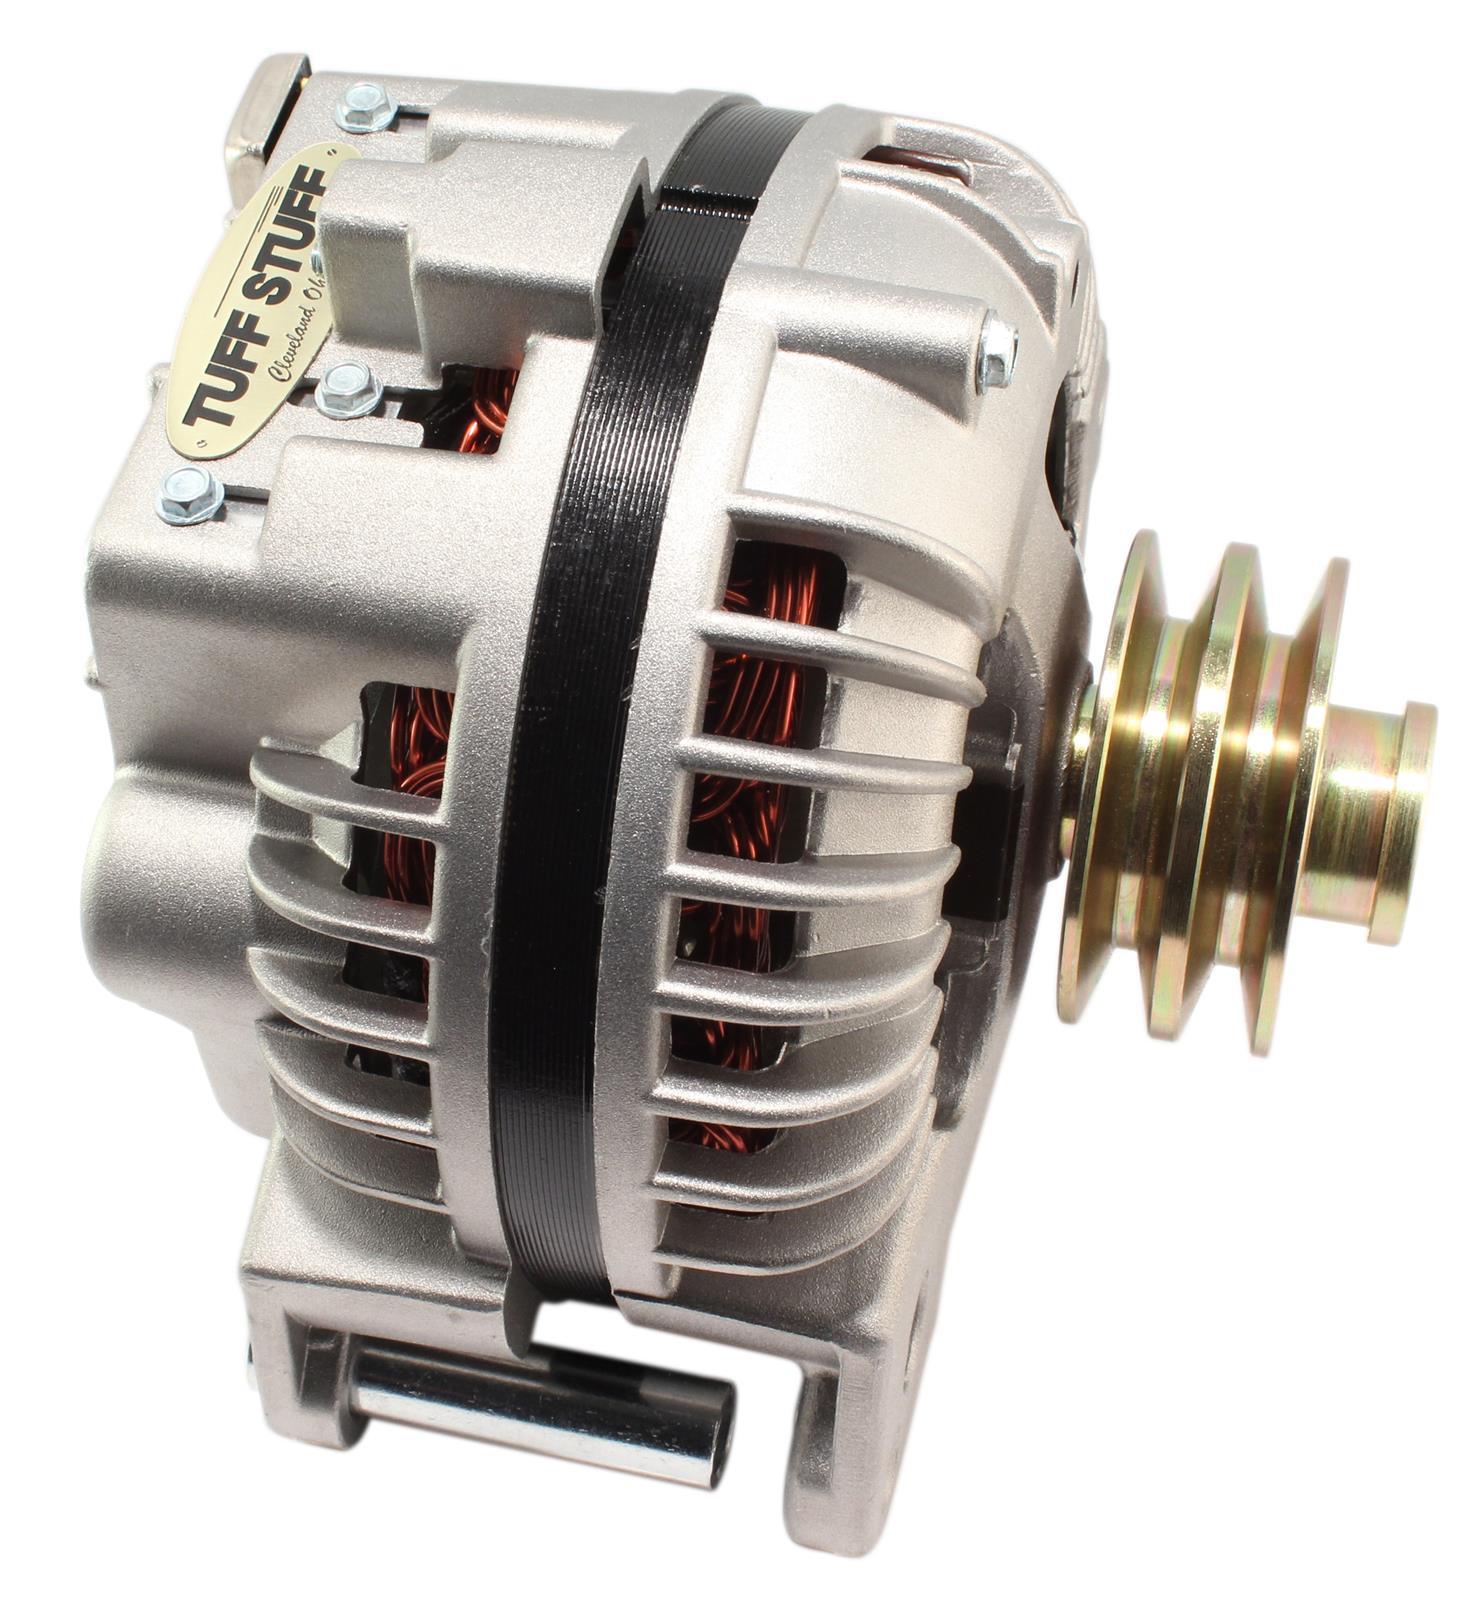 DODGE MAGNUM Tuff Stuff Performance High-Amp Output Factory Cast-Plus  Alternators 9509DP